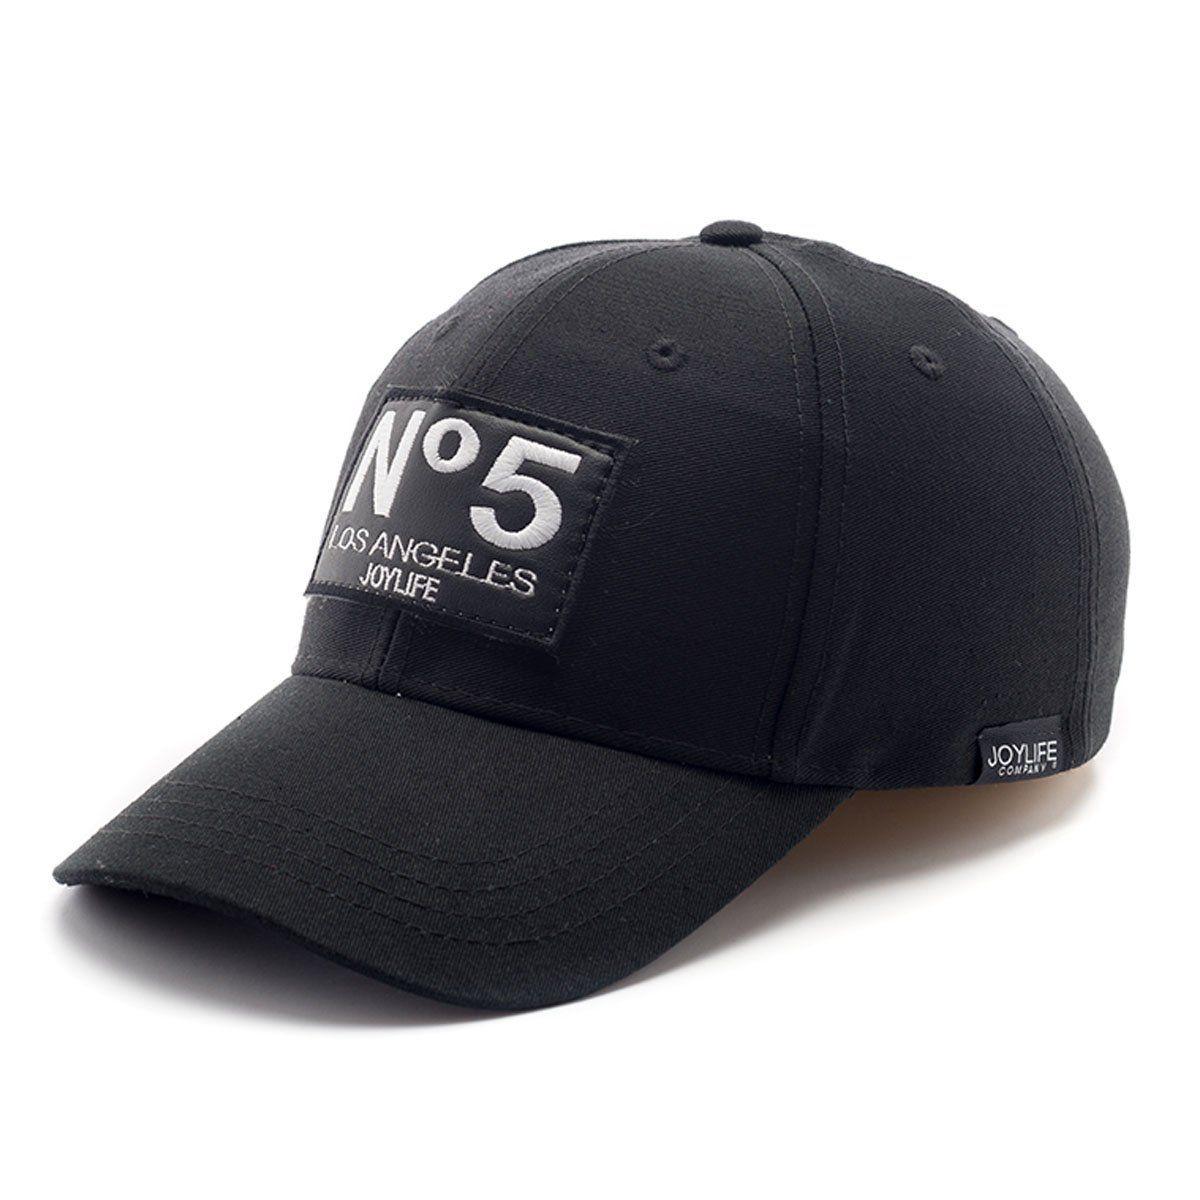 JOYLIFE  5 tipos de gorras para estar a la moda  17035b3d1b9